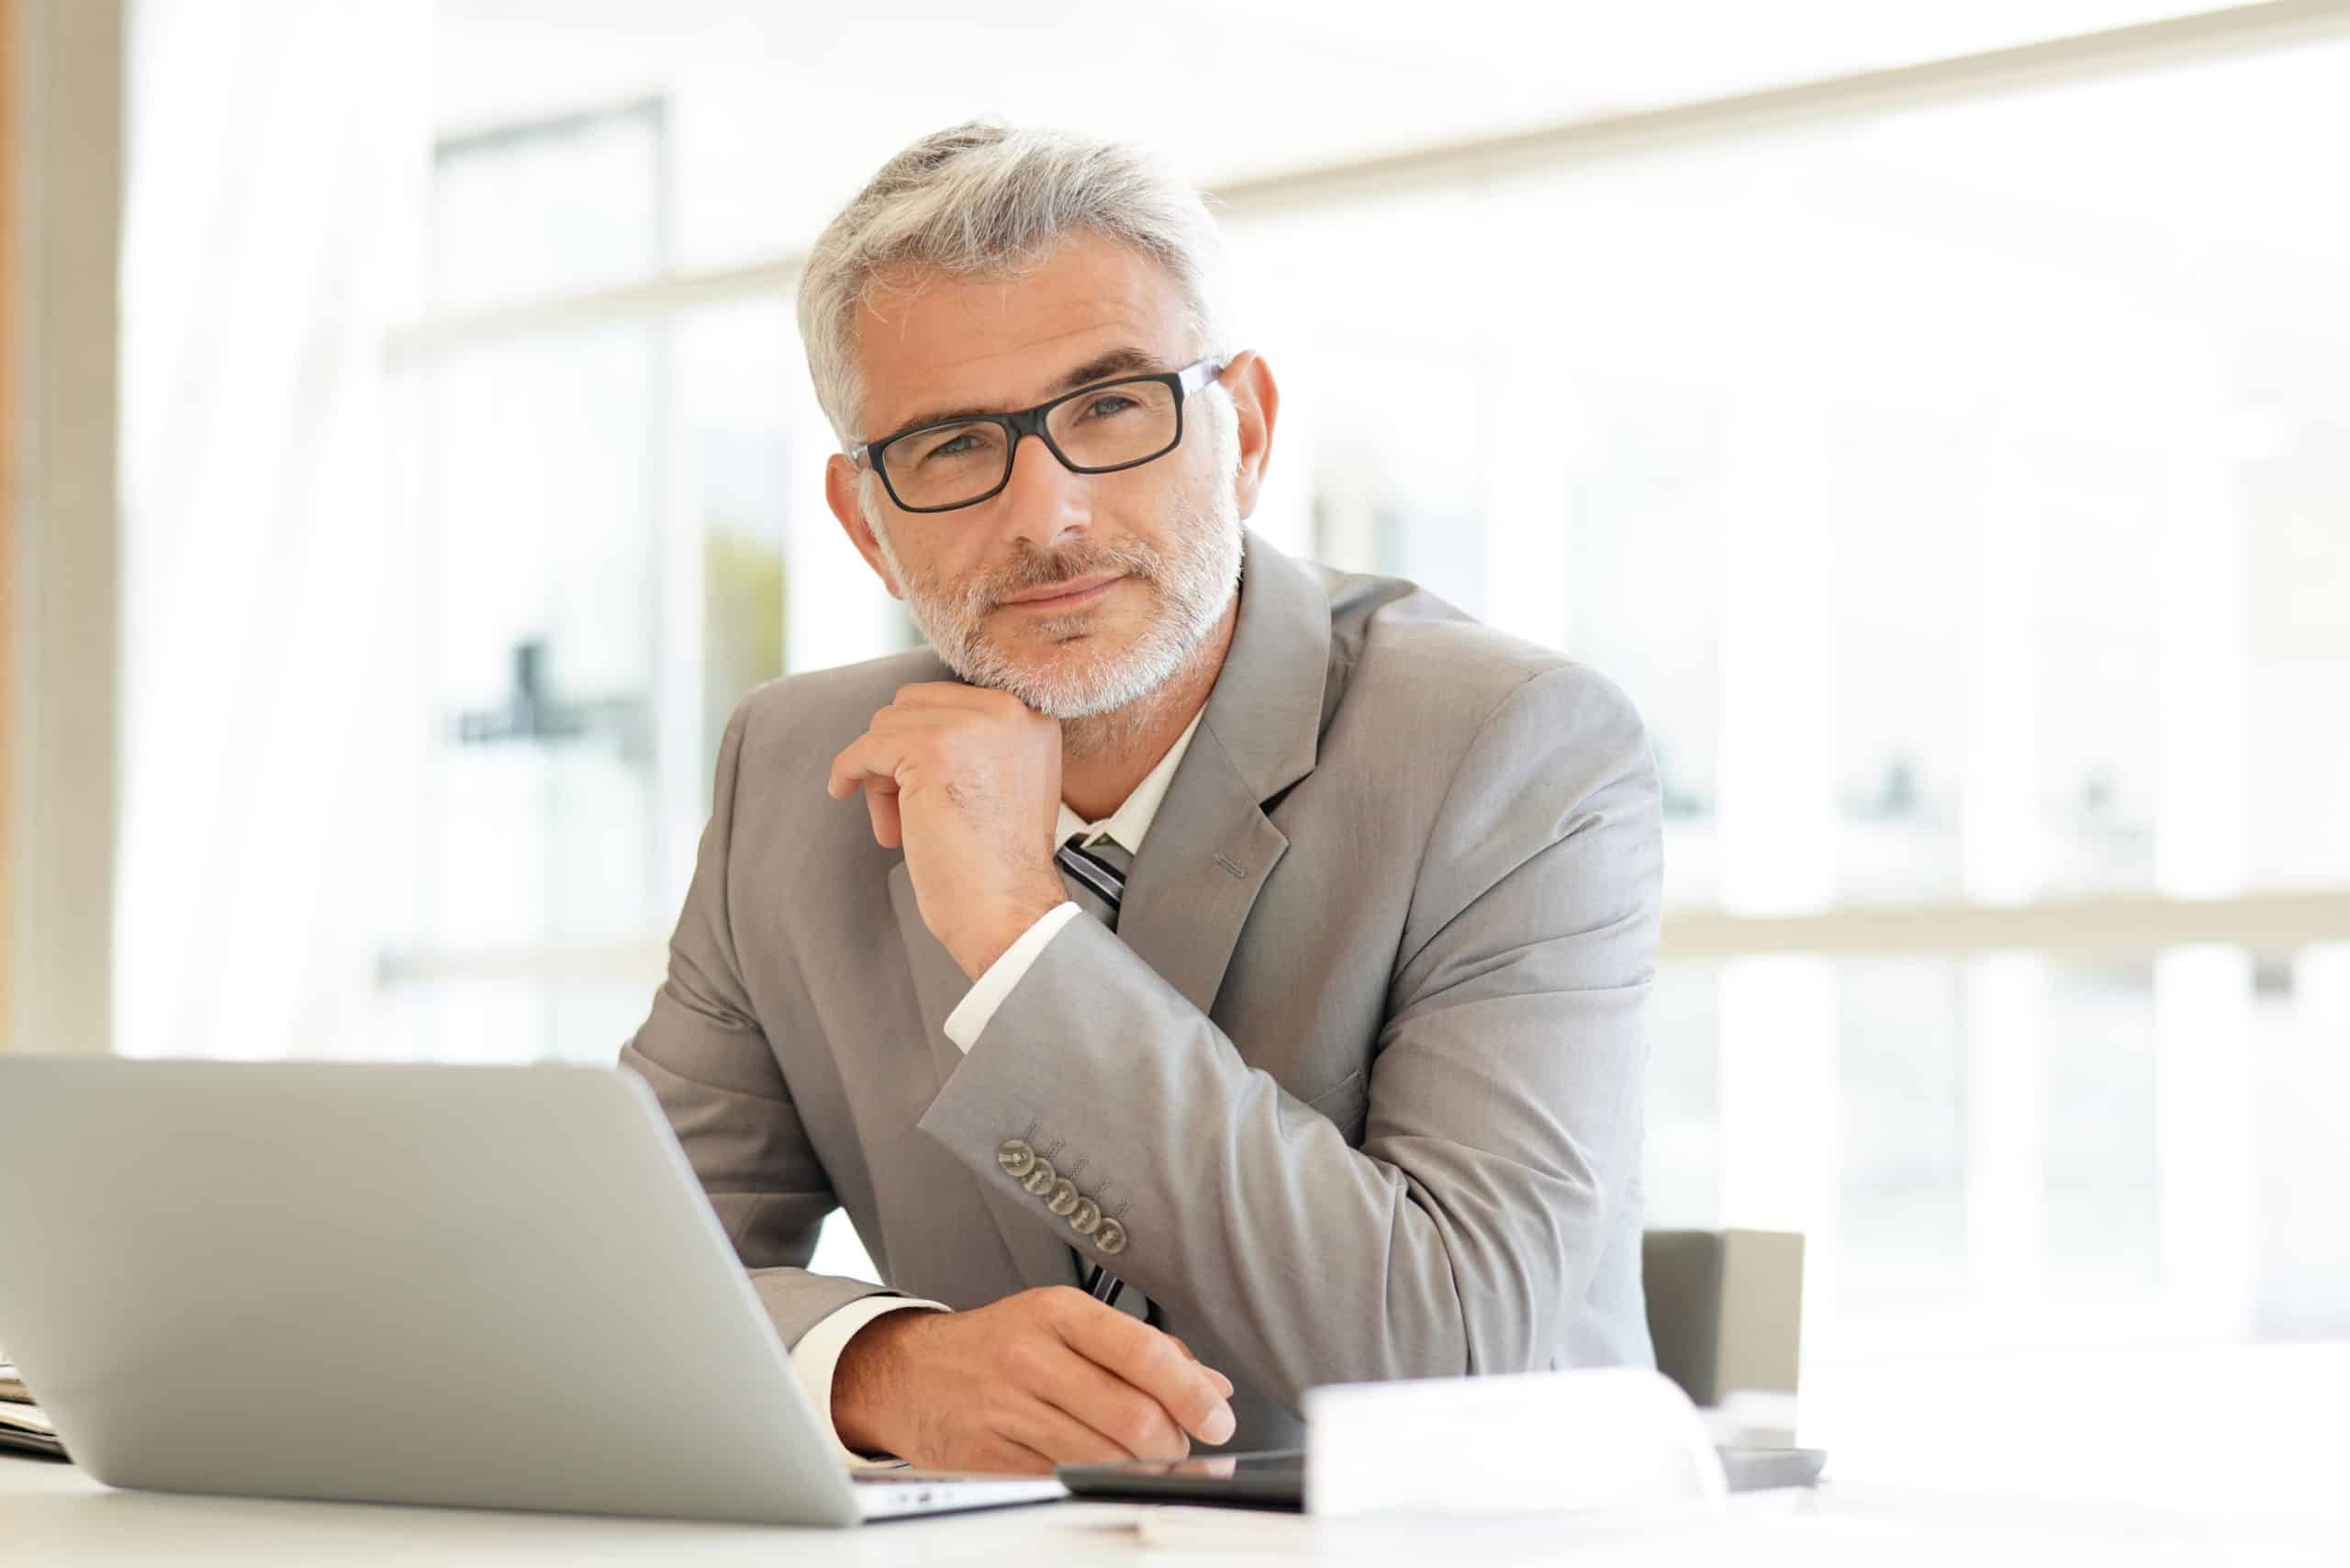 Mature businessman sitting at desk looking at camera